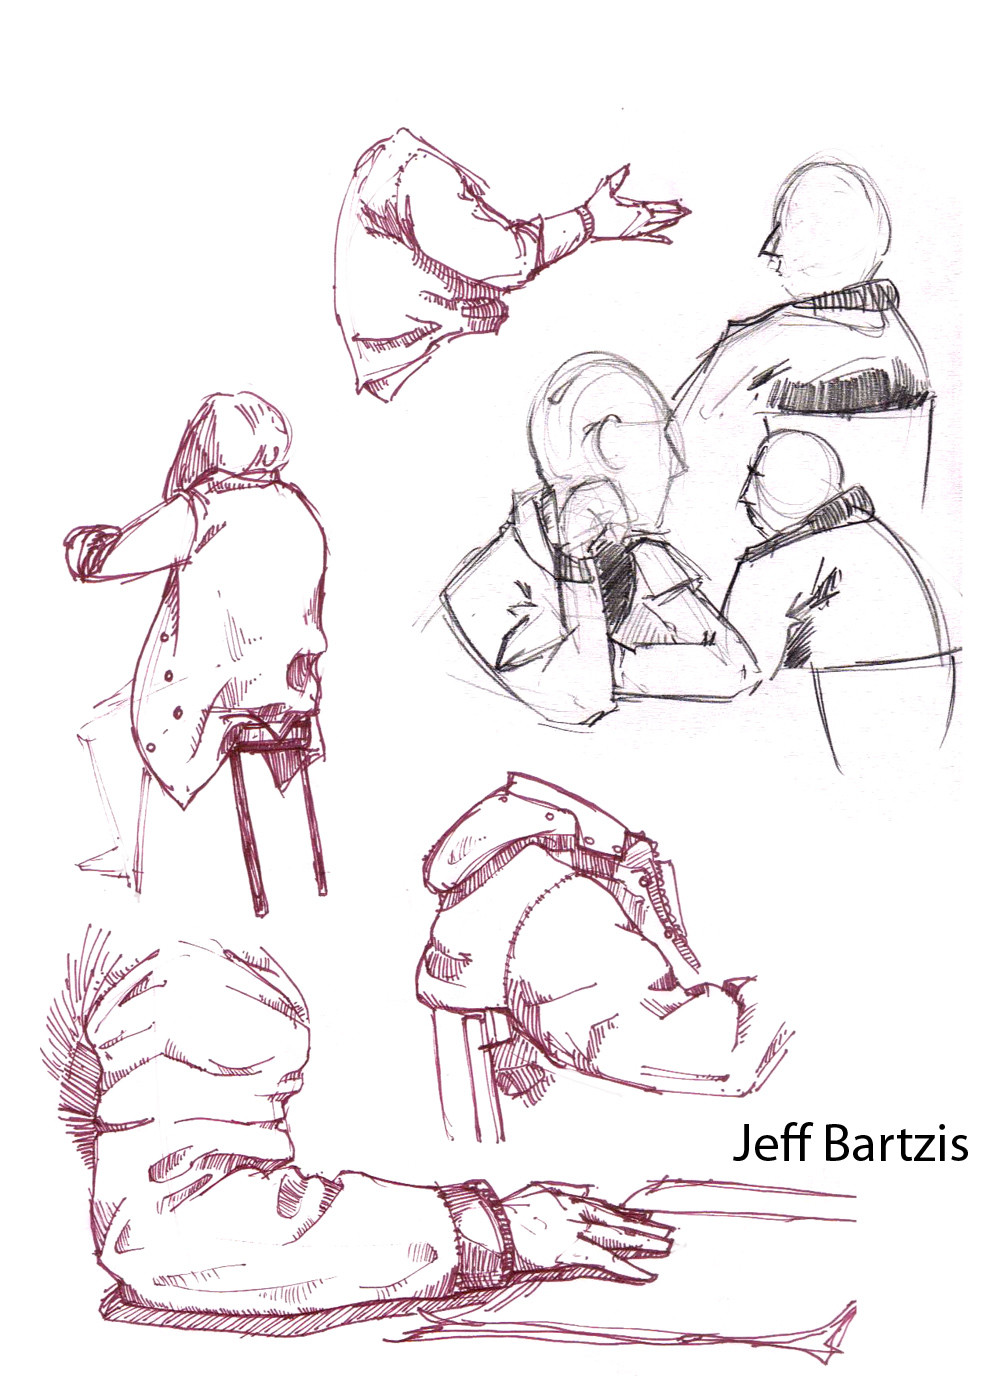 Jeff bartzis sketchbook stuff 006